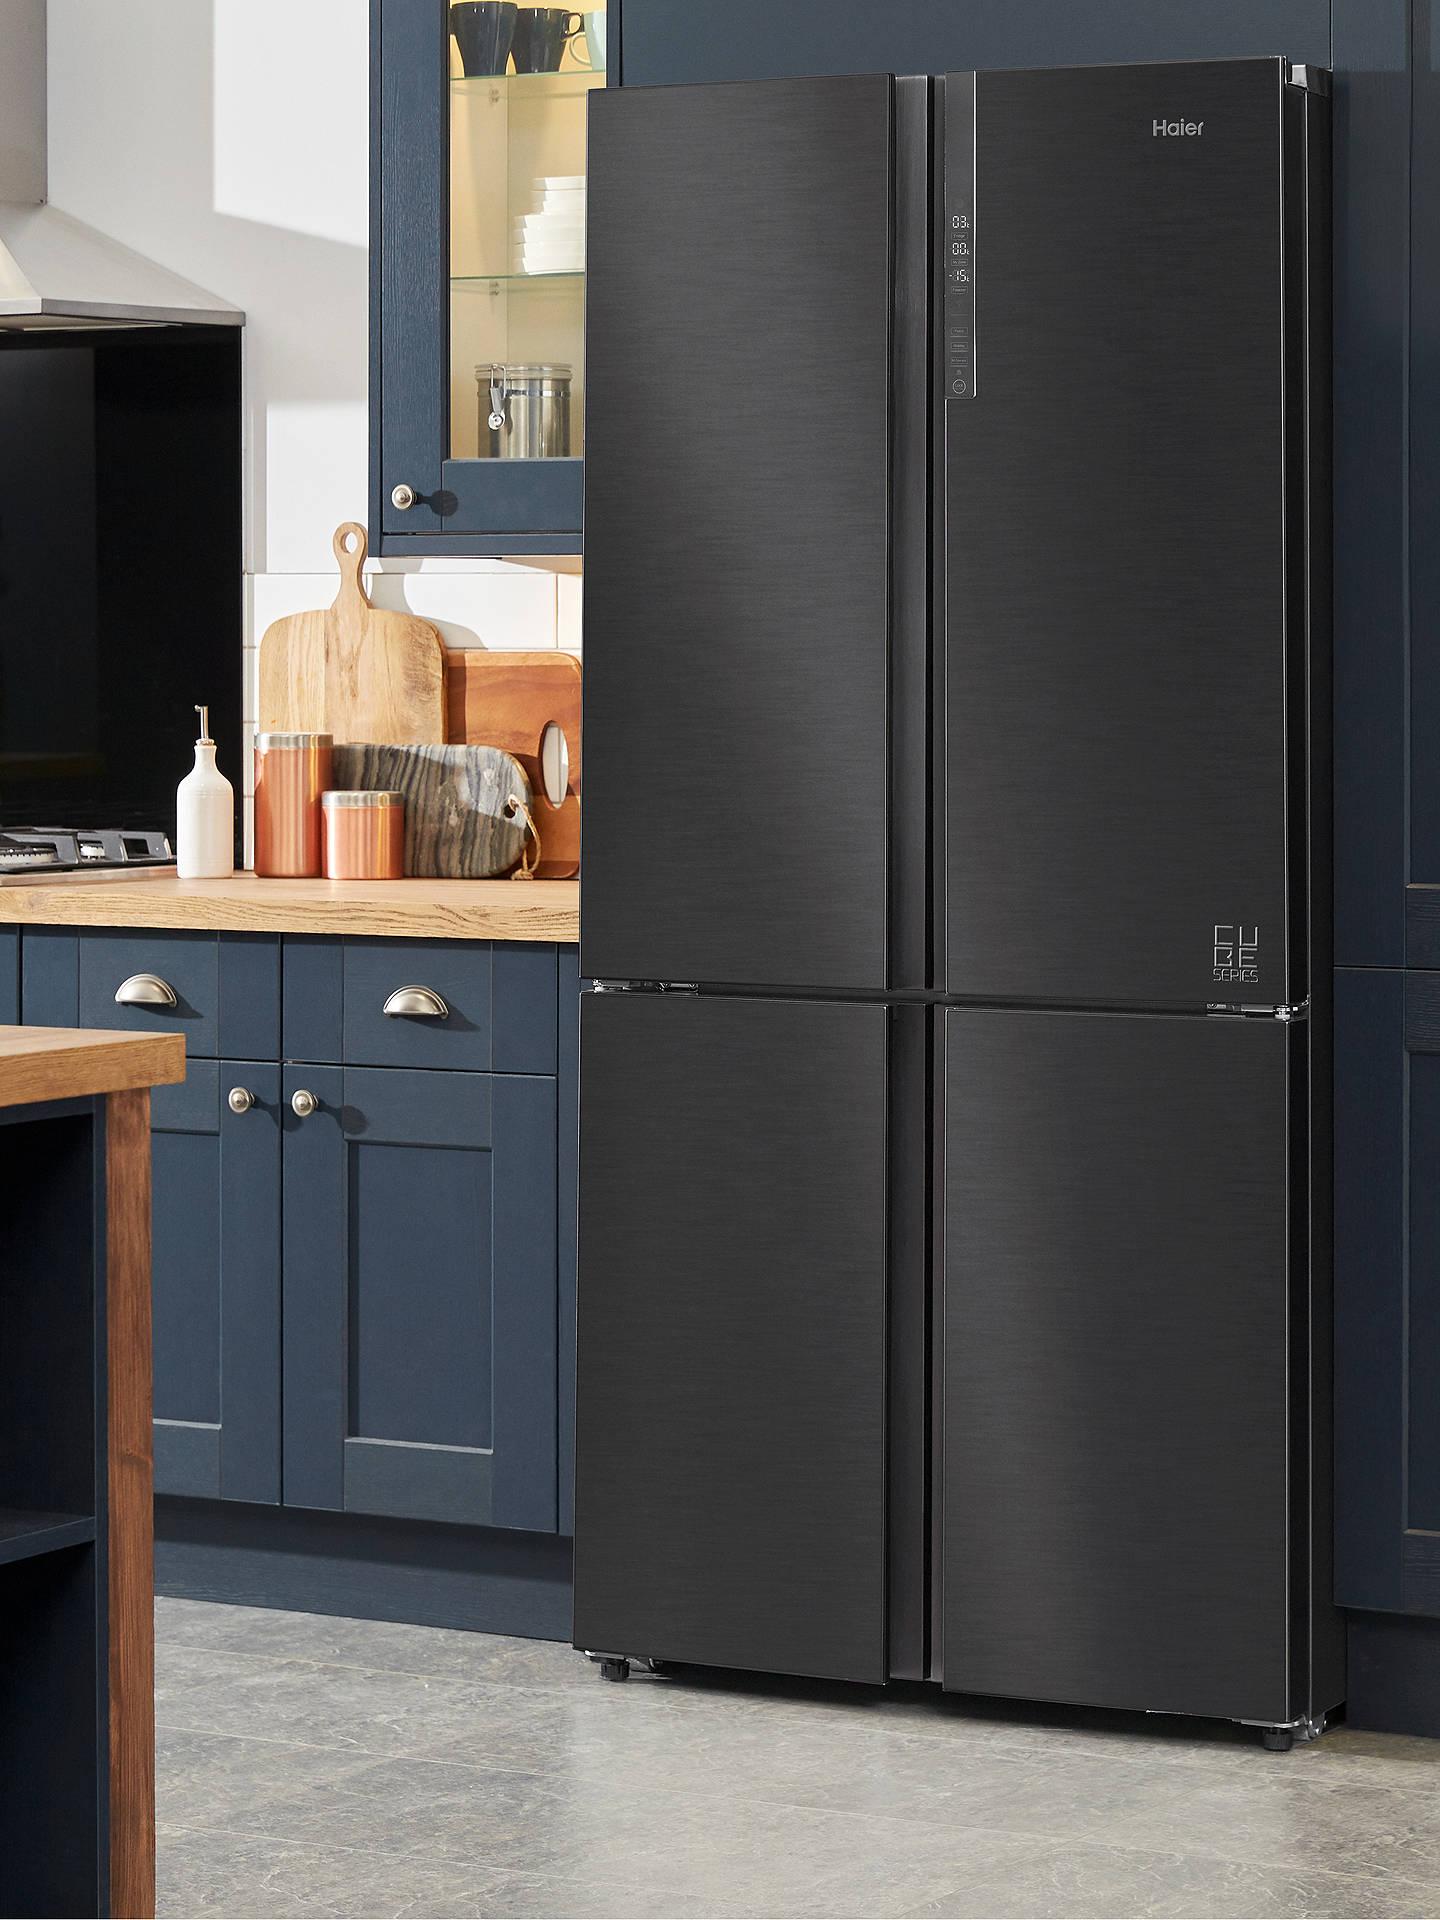 Haier Cube Series HTF-610DSN7 American-Style Freestanding Fridge Freezer,  91cm Wide, A++ Energy Rating, Black Stainless Steel